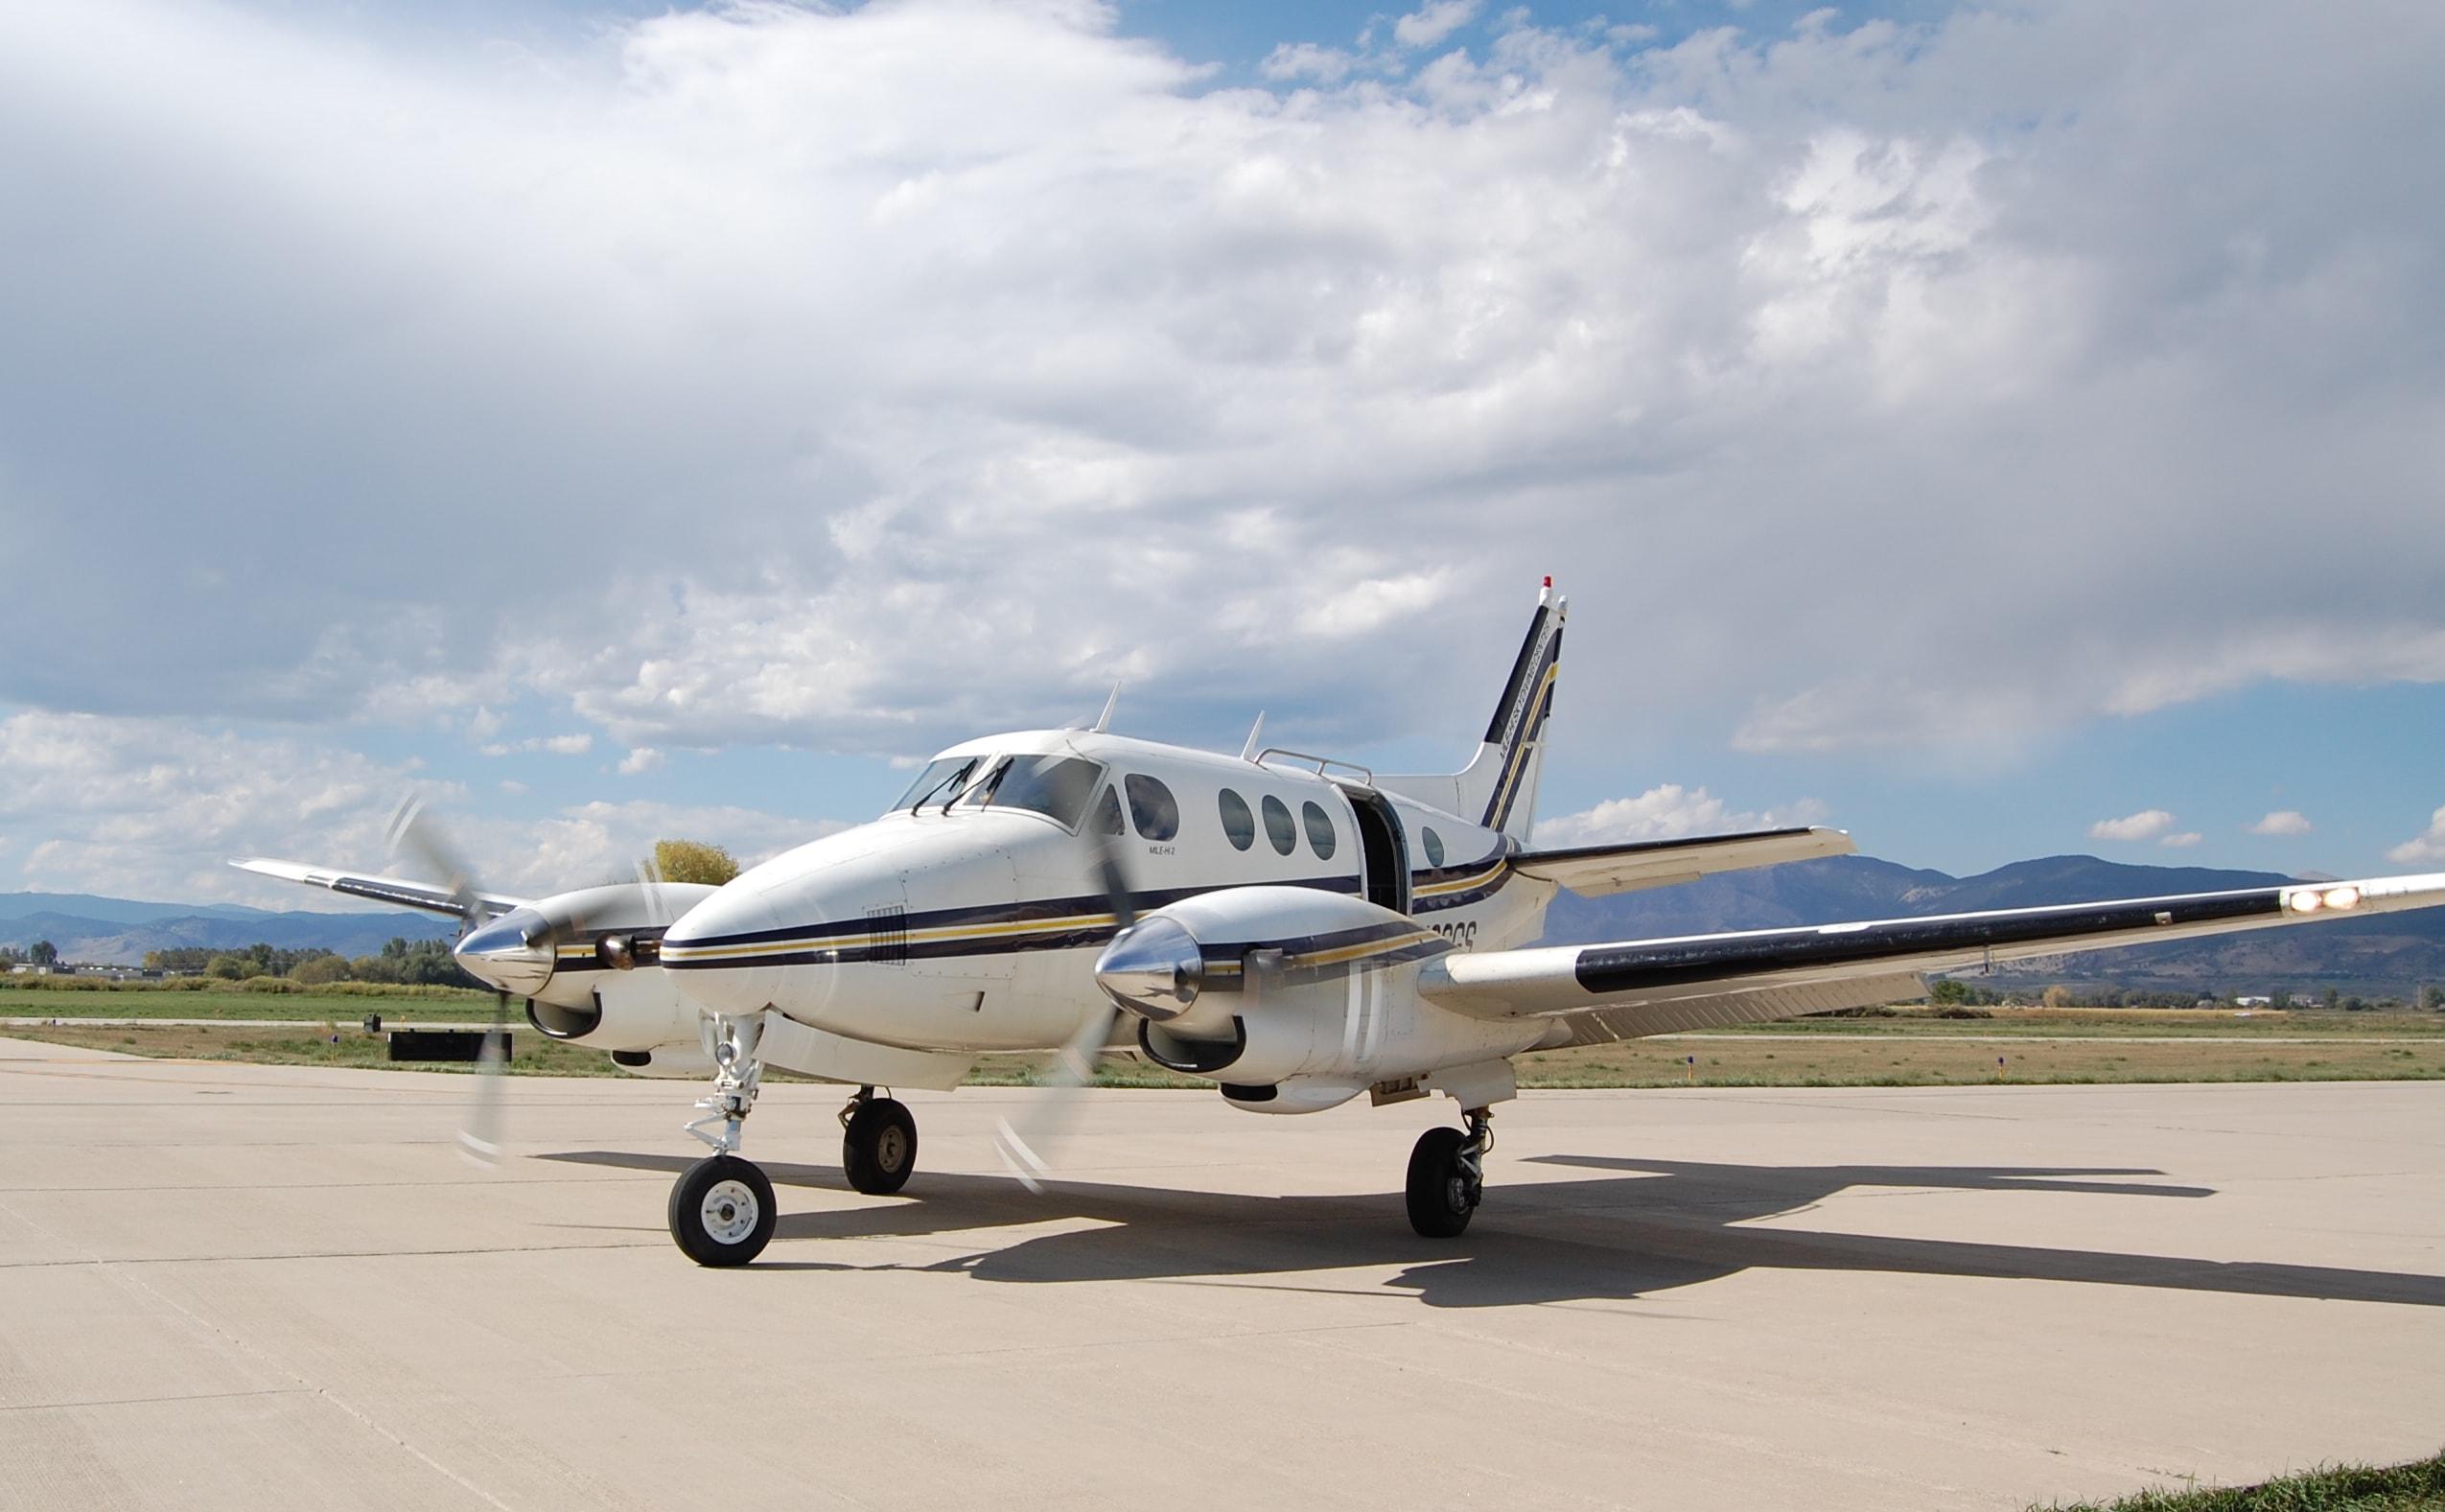 Location d'un avion privé beech 65 A90